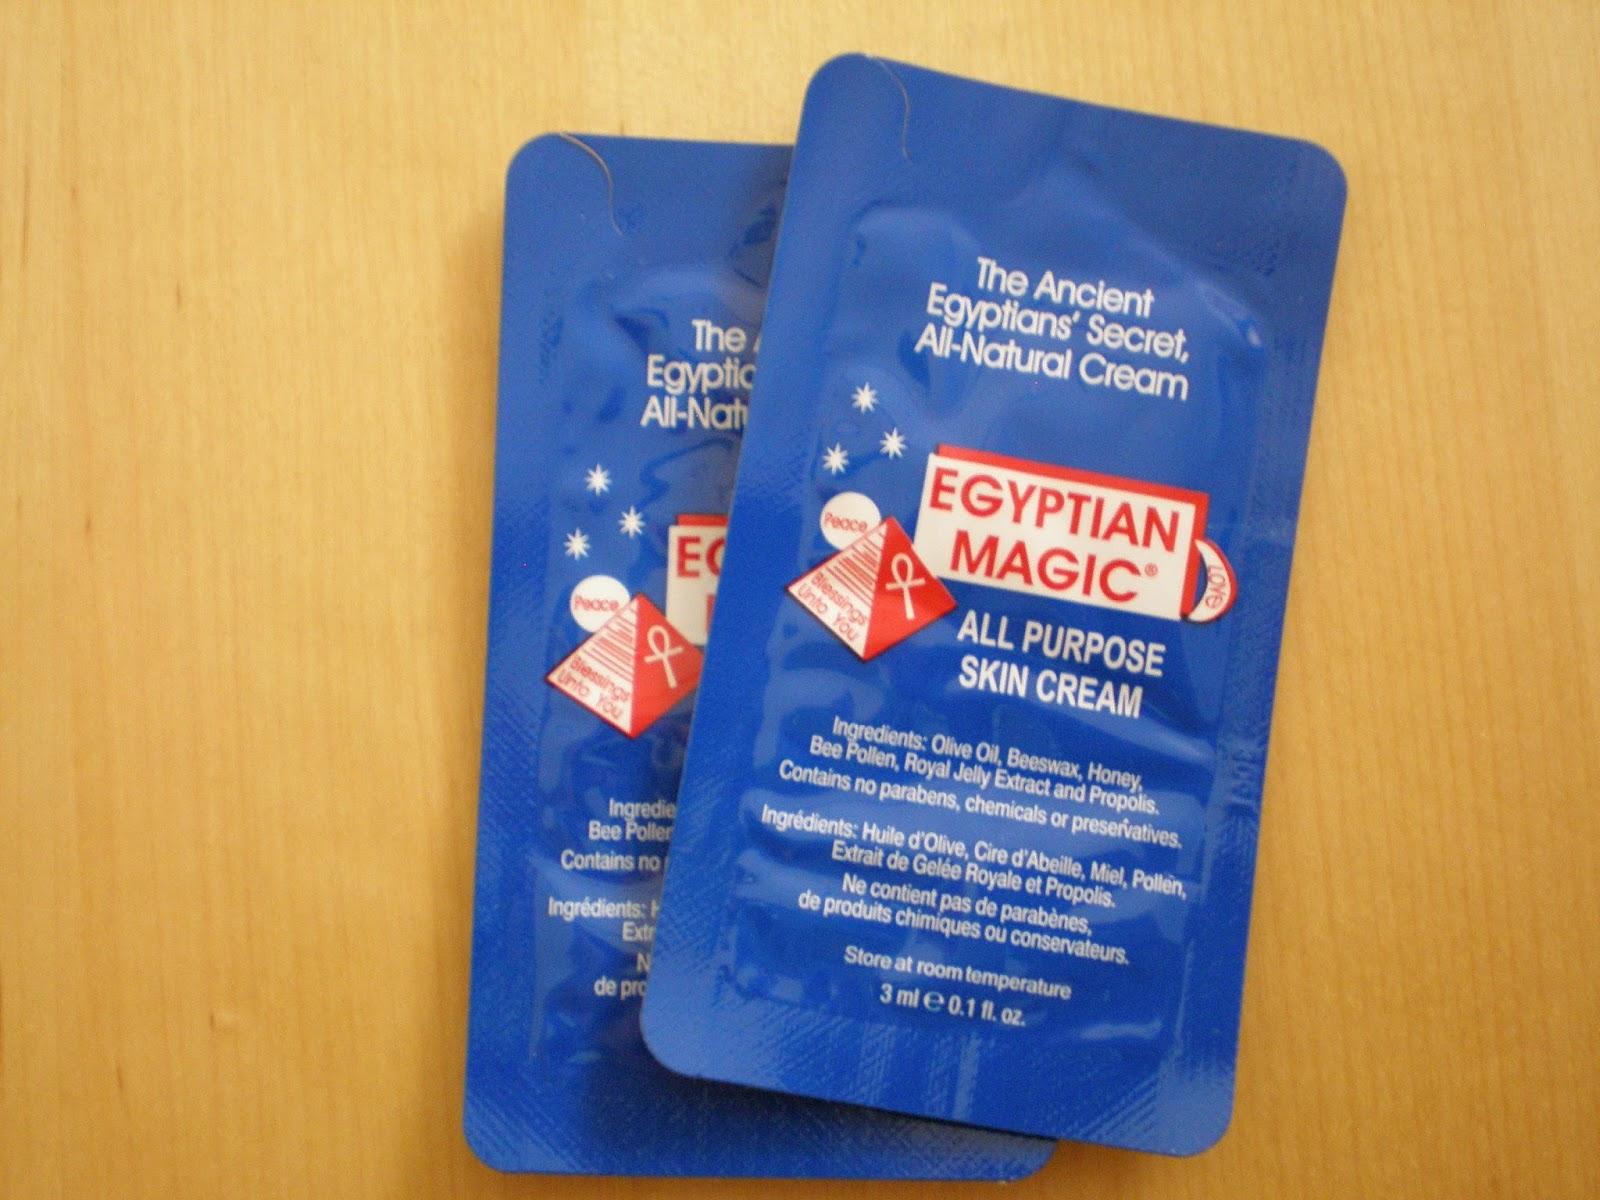 EGYPTIAN MAGIC, All Purpose Skin Cream